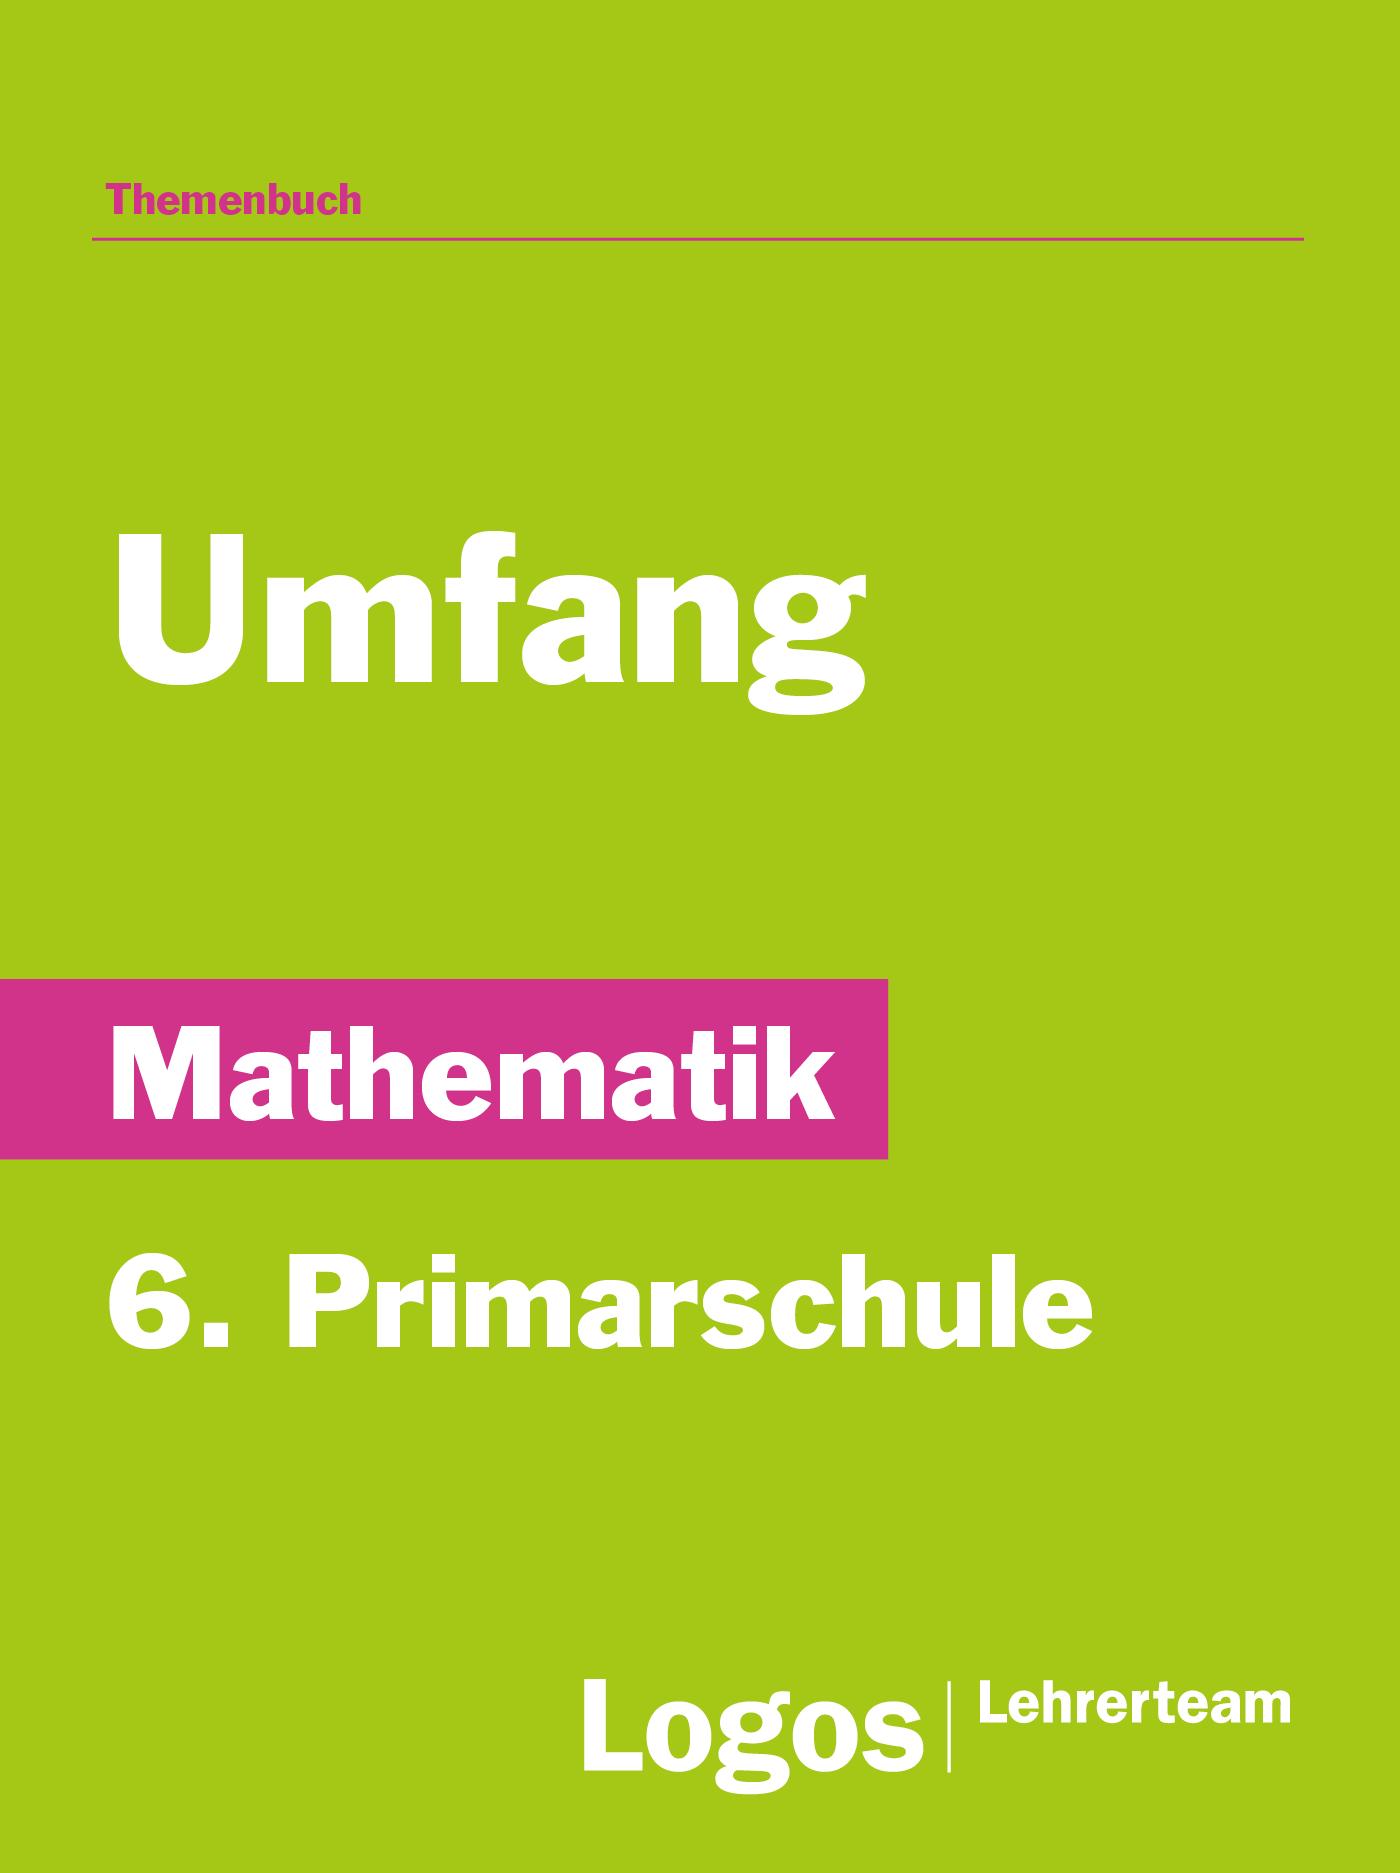 Mathematik Umfang - Primar